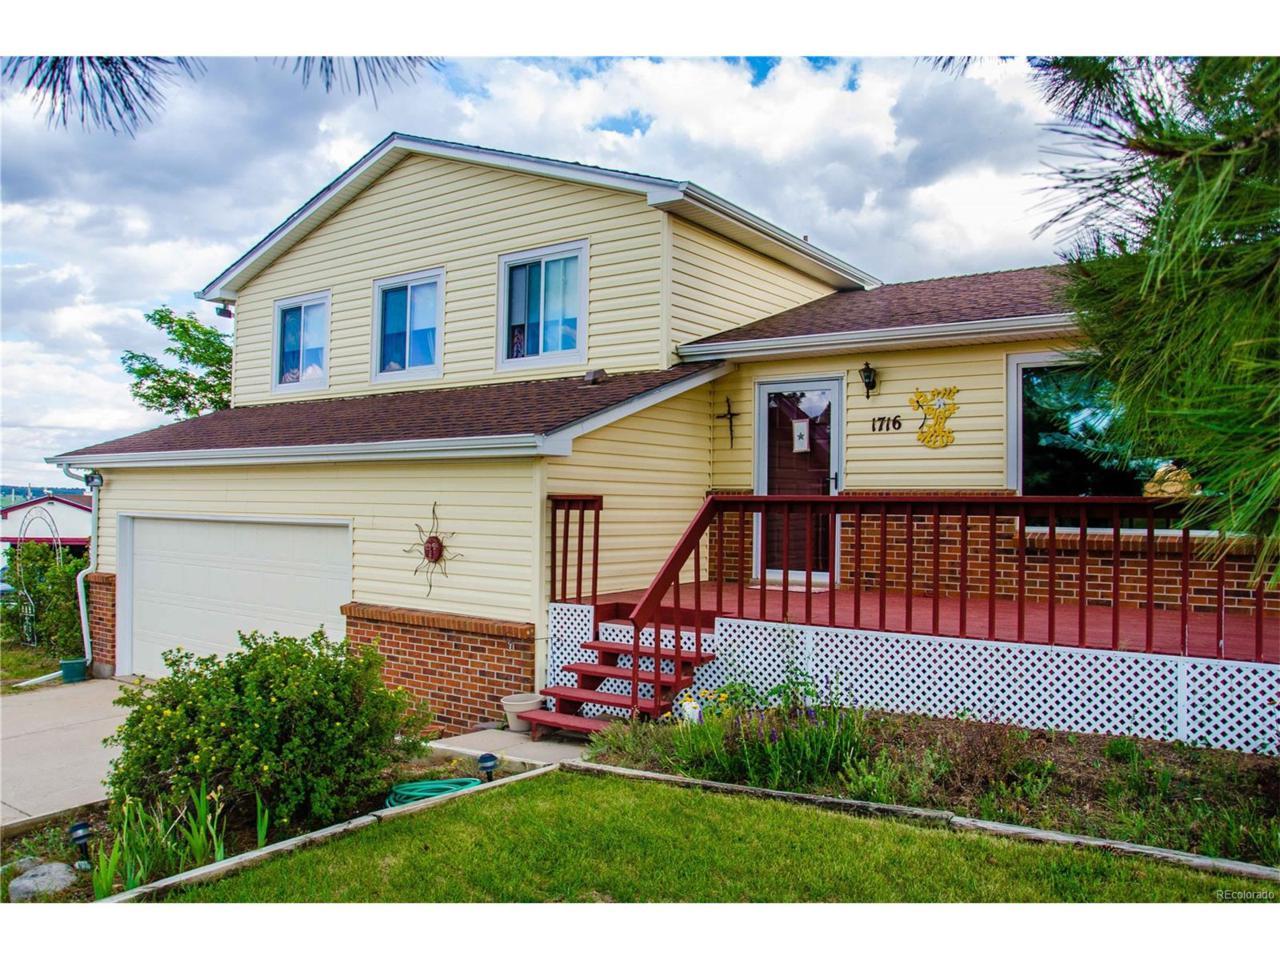 1716 Shoshone Trail, Elizabeth, CO 80107 (MLS #8928762) :: 8z Real Estate